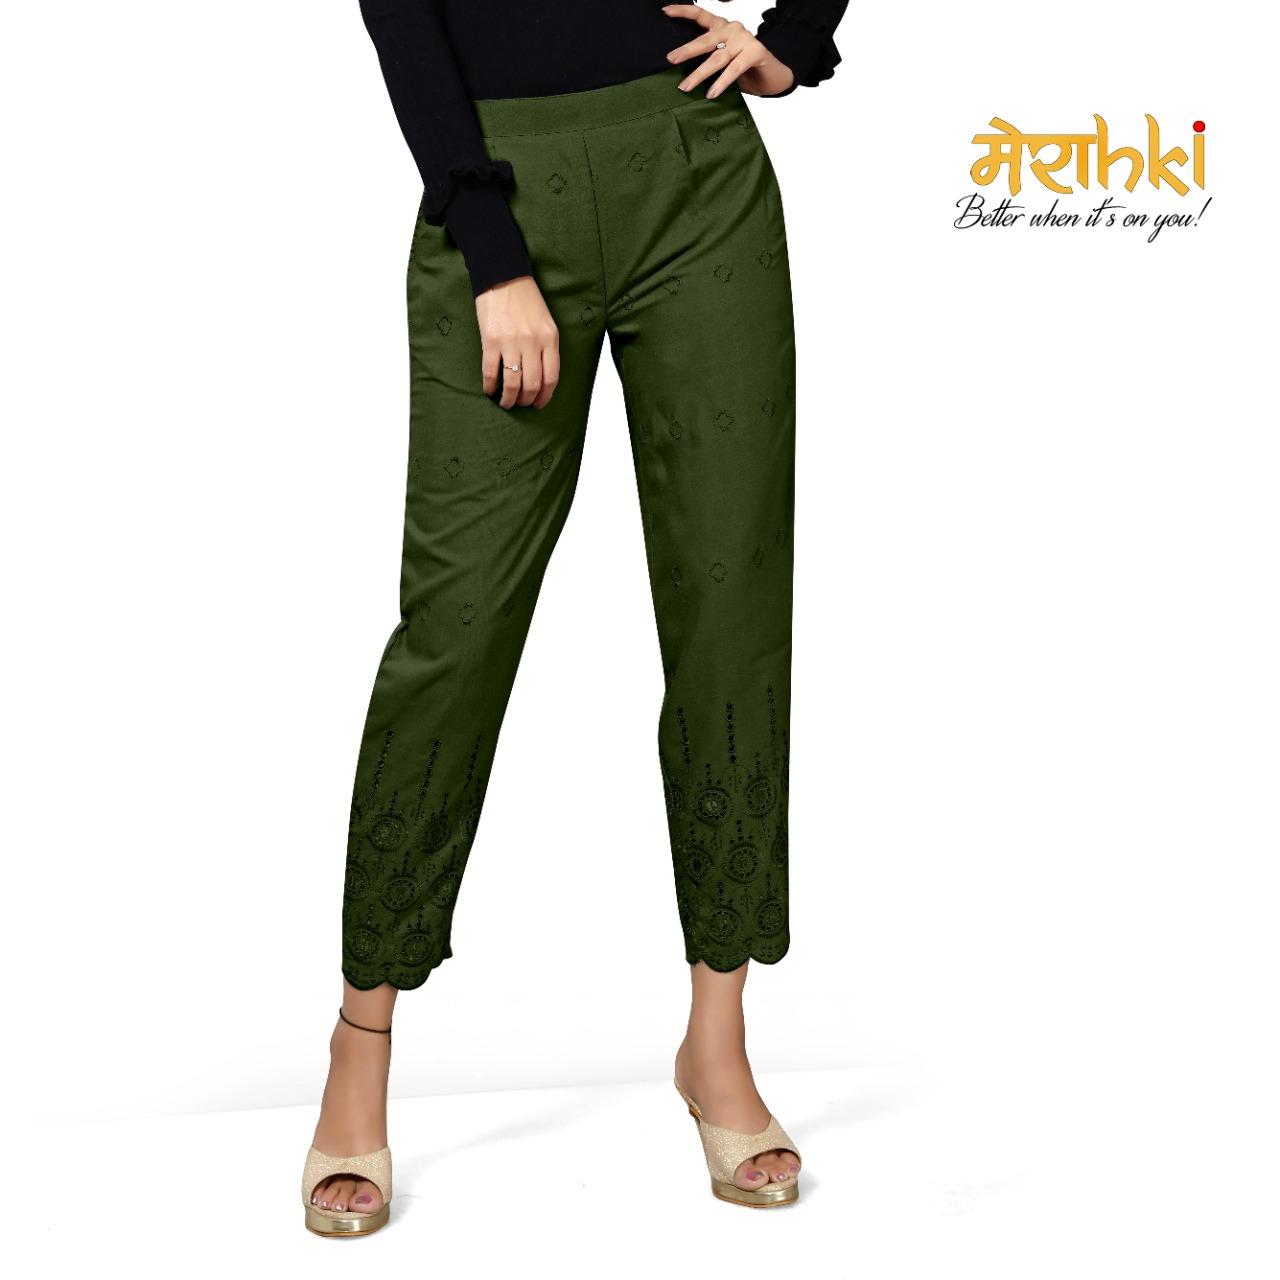 Merahki Present Schiffli Rayon Pant Bottom Wear Collection